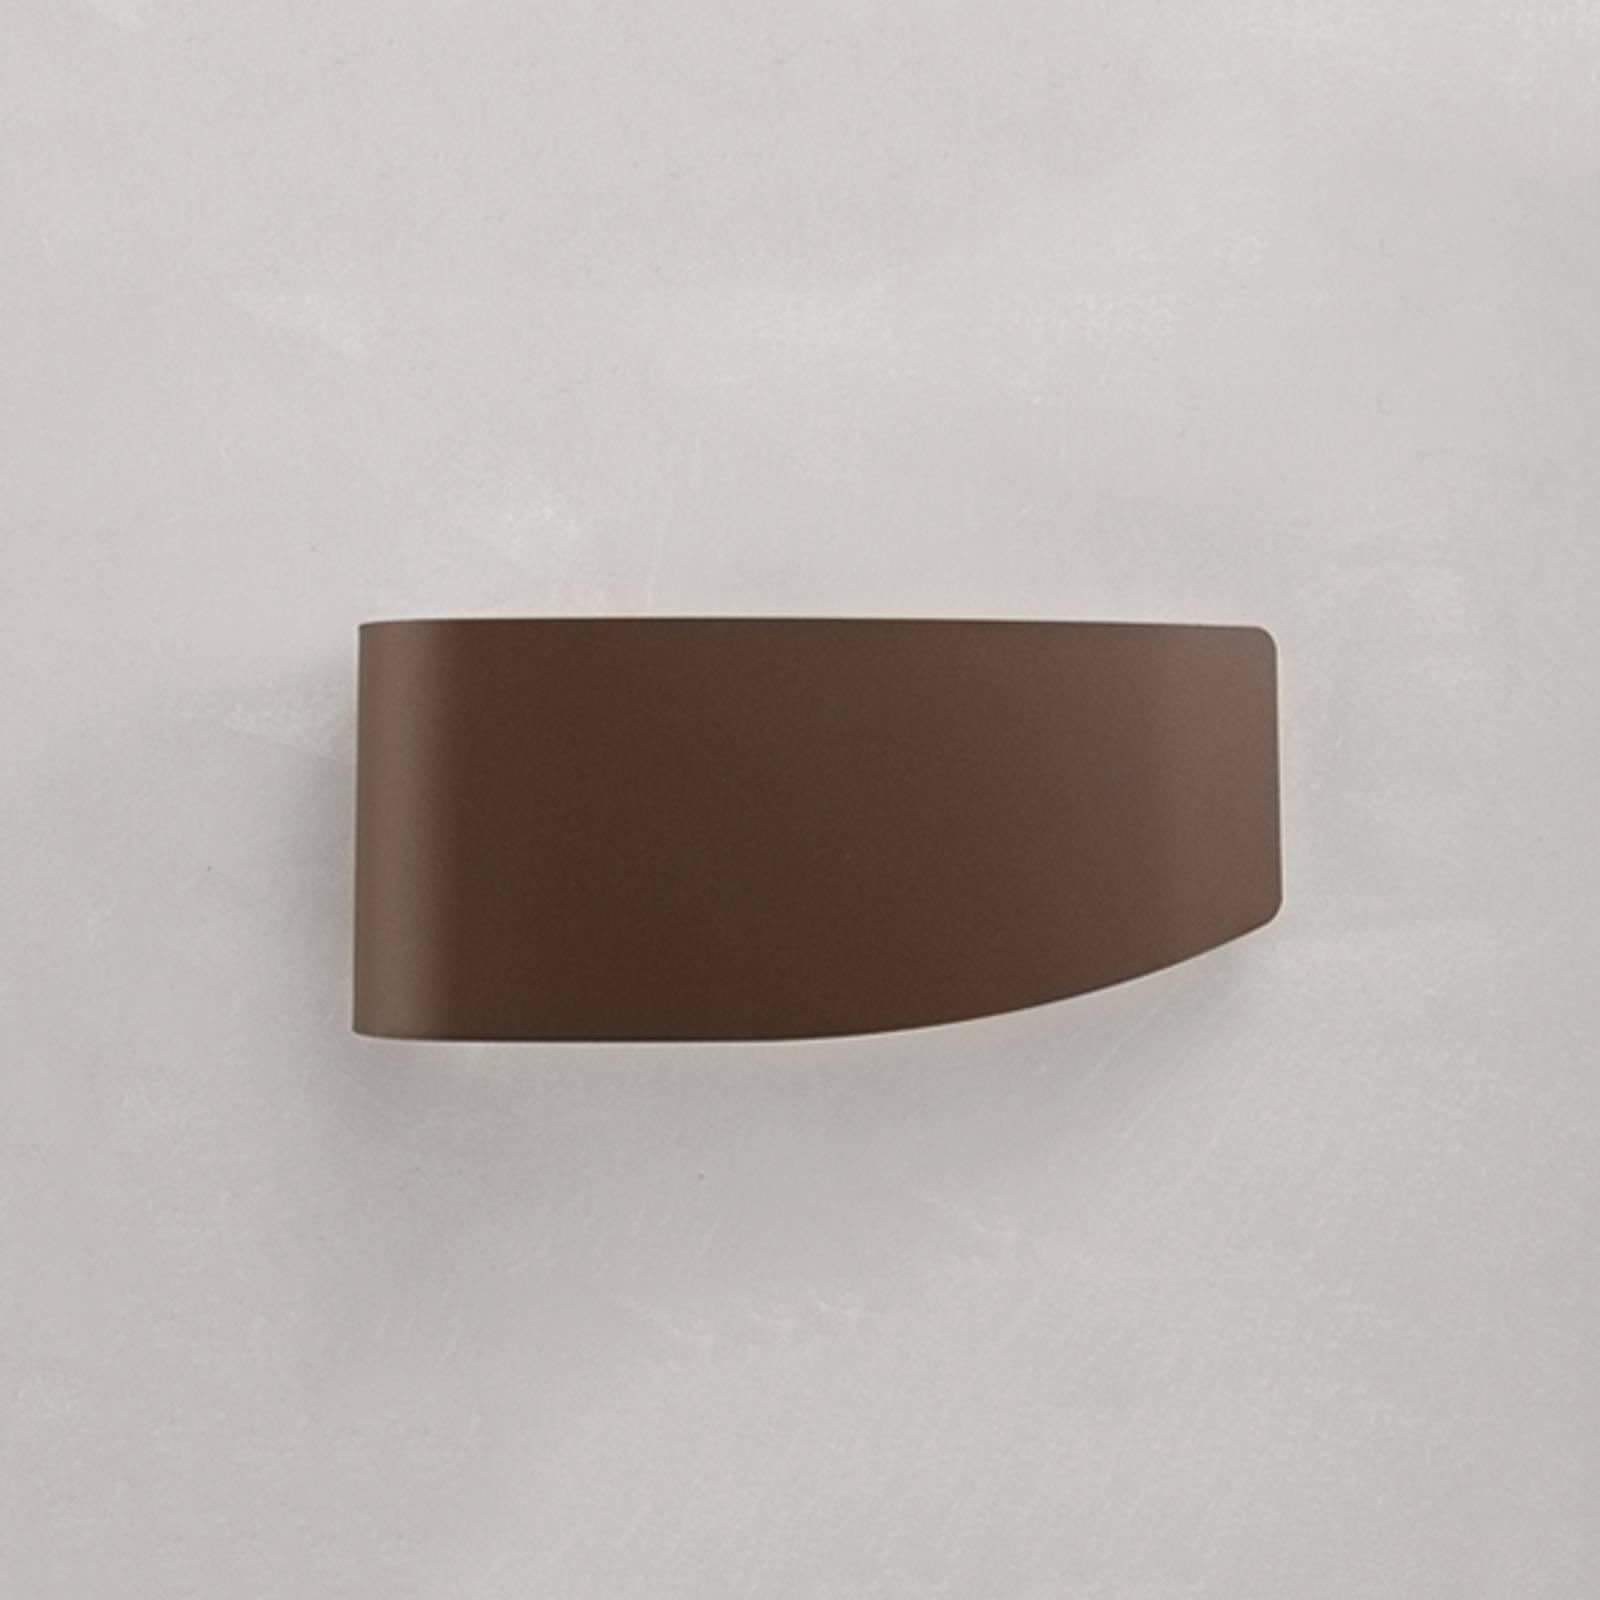 Applique décorative Virgola, brune